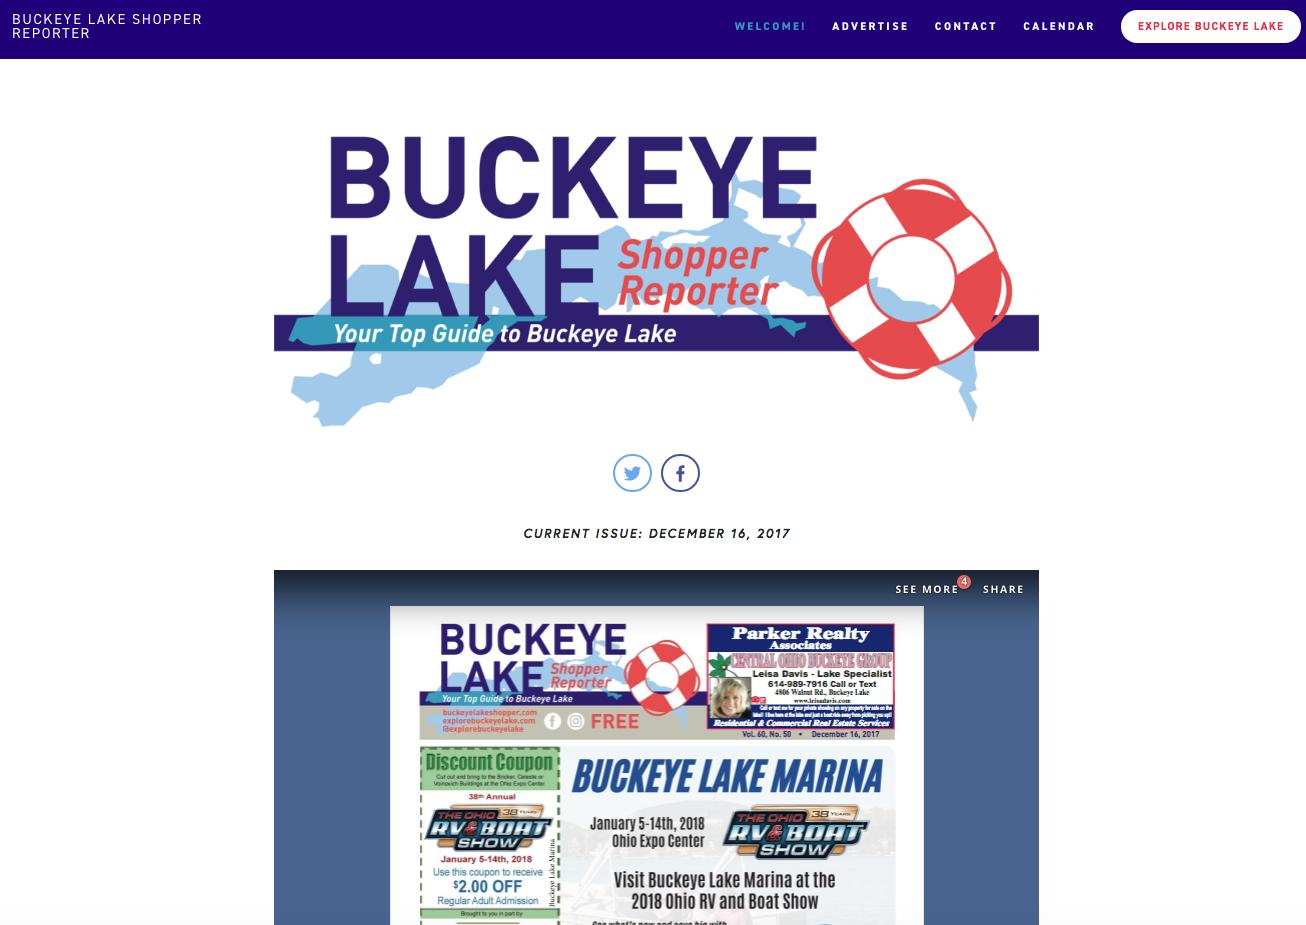 Buckeye Lake Shopper Reporter